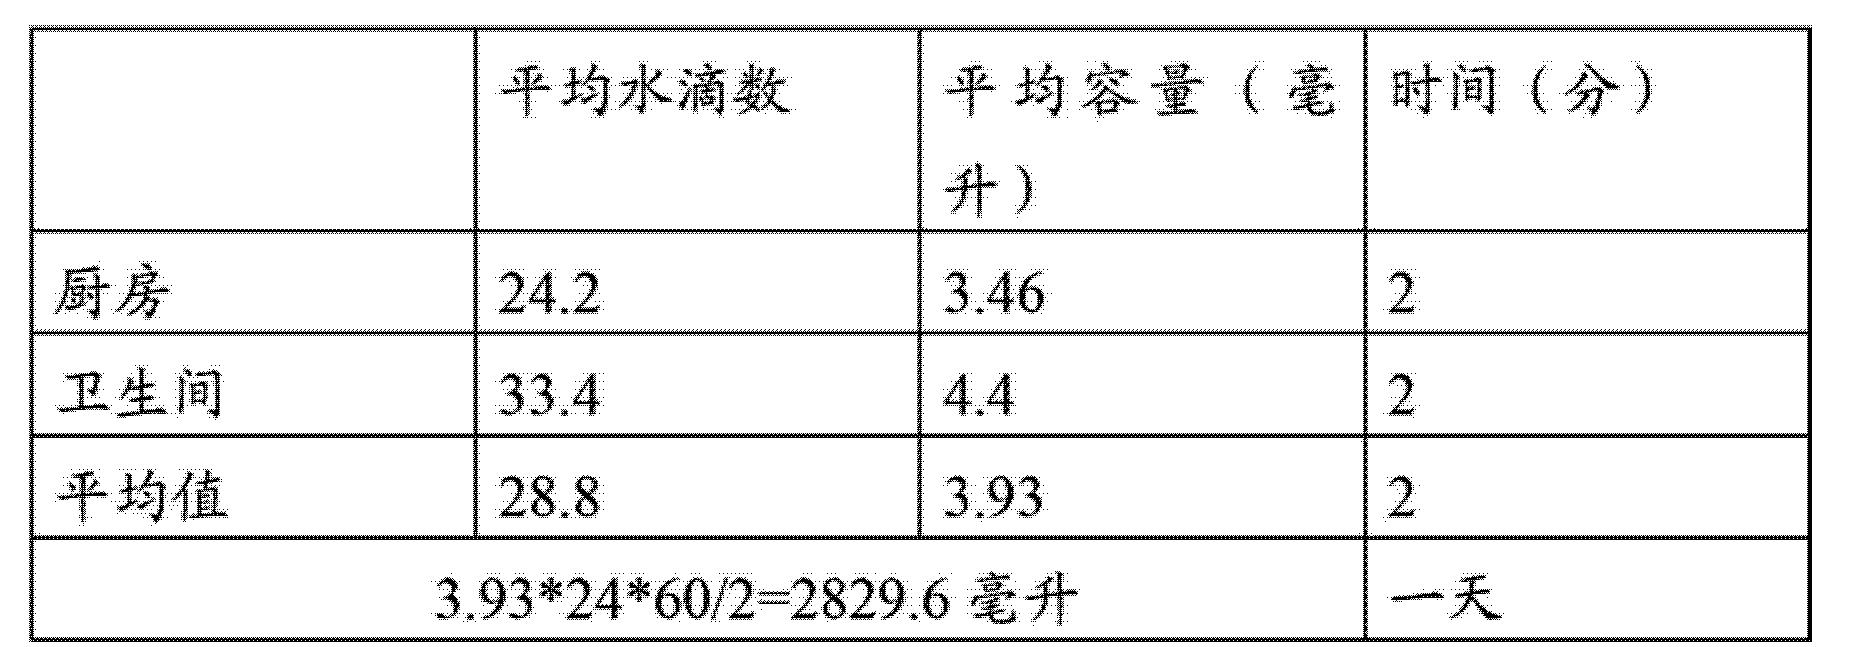 Figure CN202936850UD00061